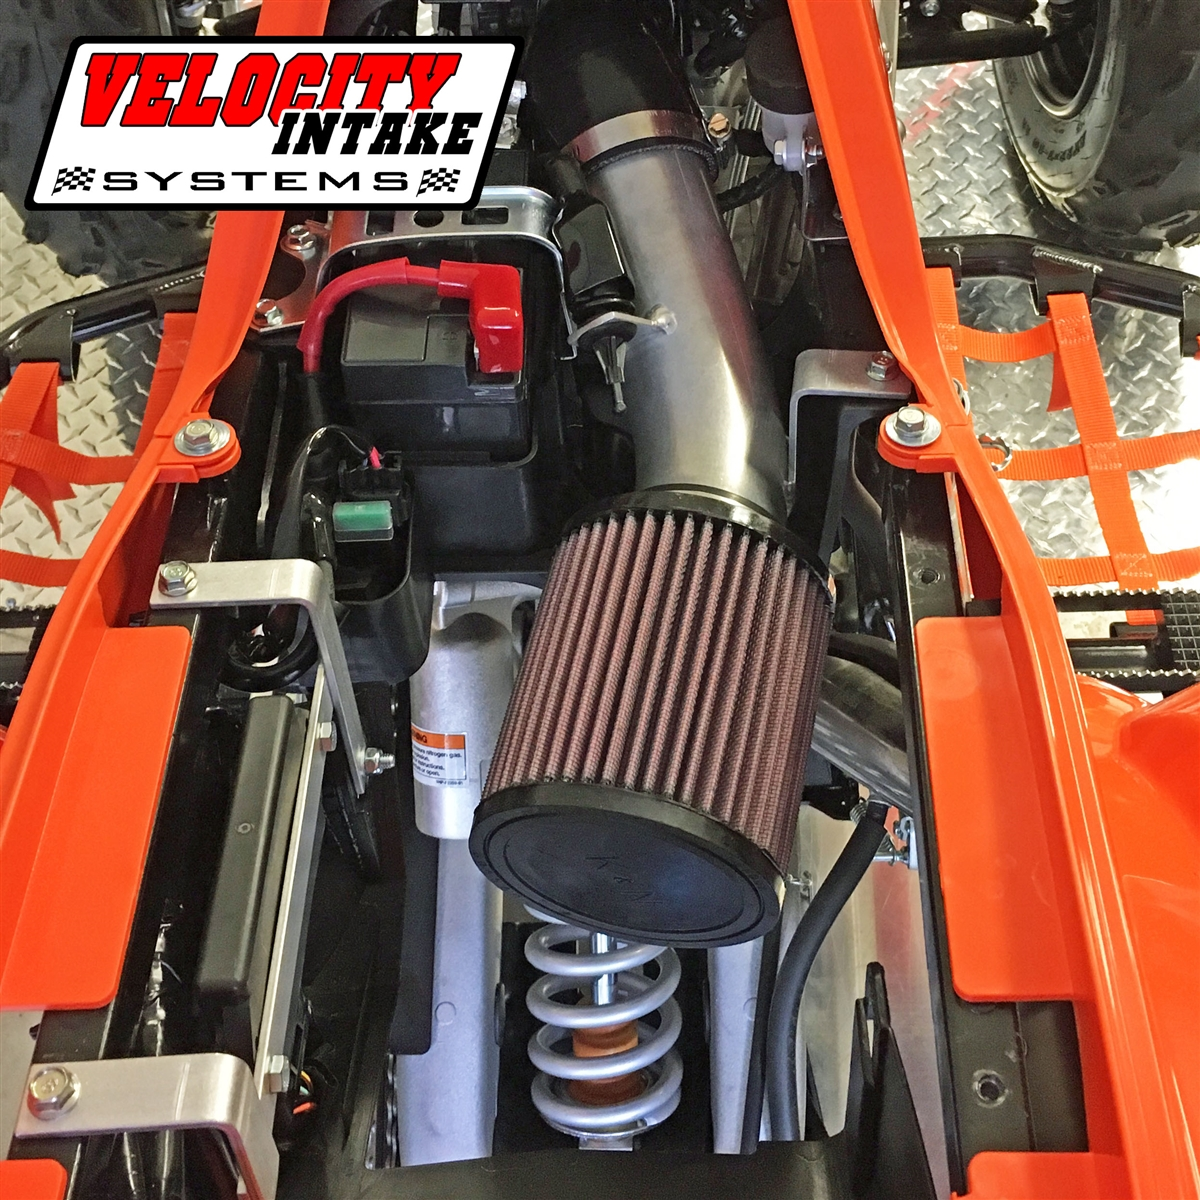 Raptor 700 06-14 Velocity Intake Kit w// K/&N Performance Air Filter /& Outerwears